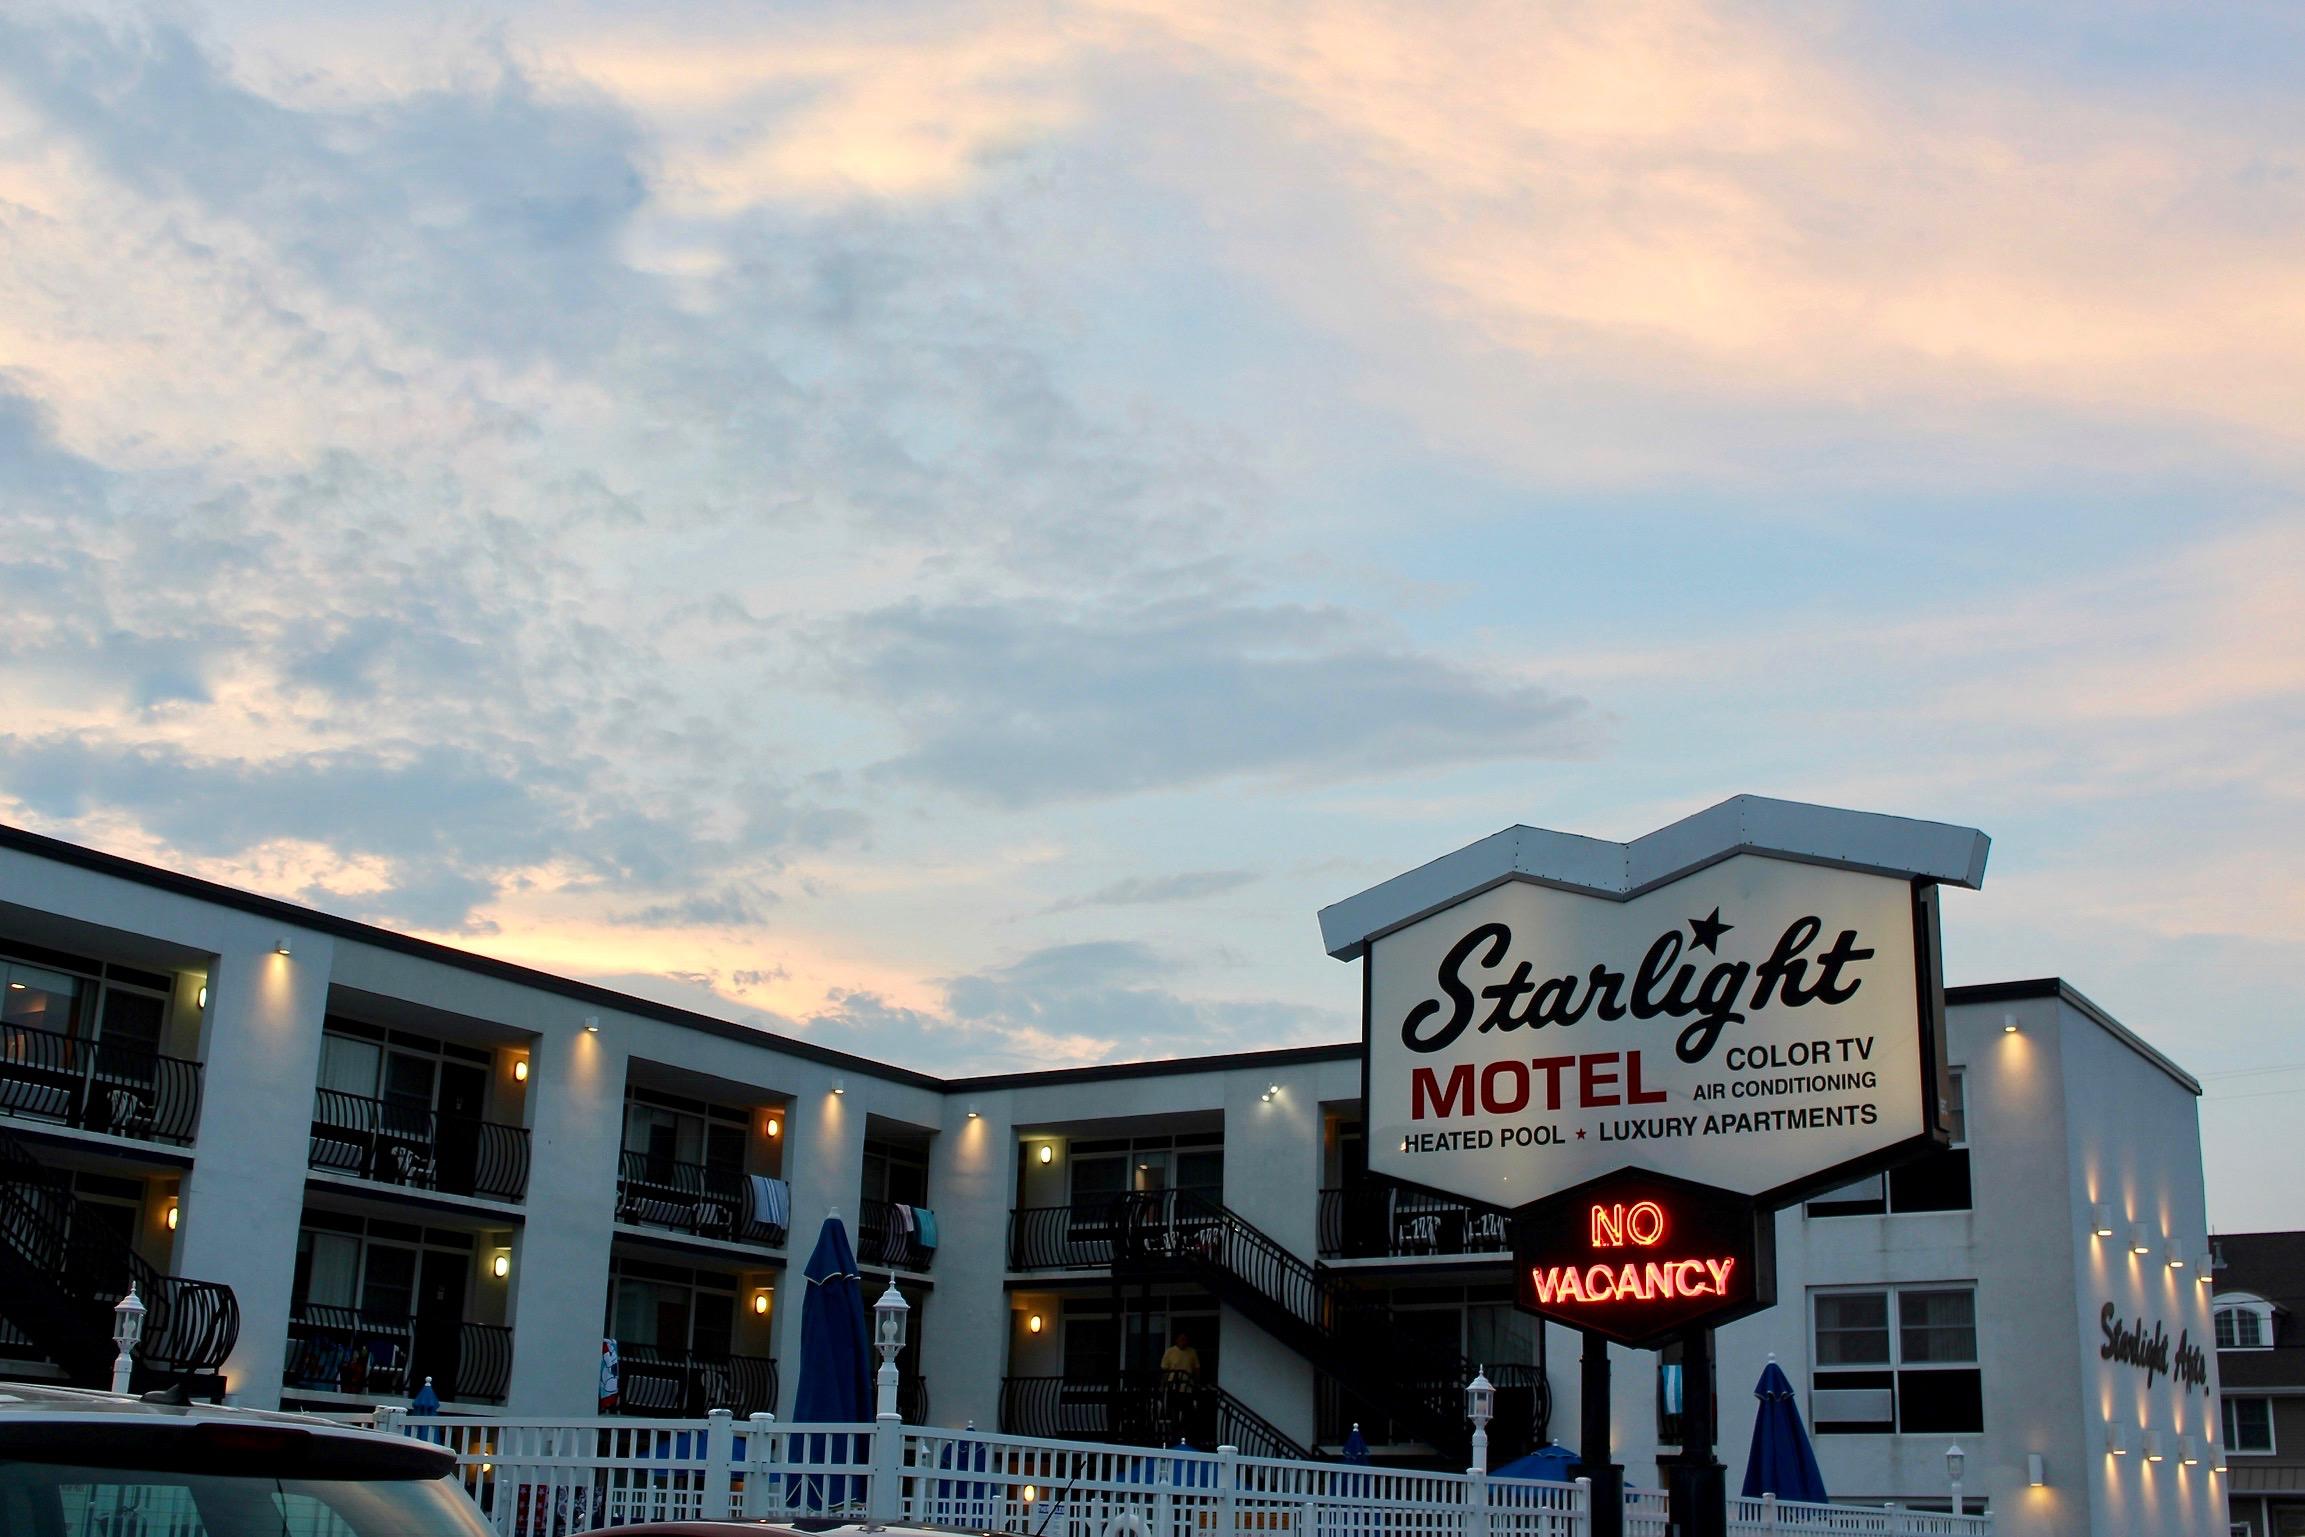 Starlight Motel, Ortley Beach (Photo: Starlight Motel)